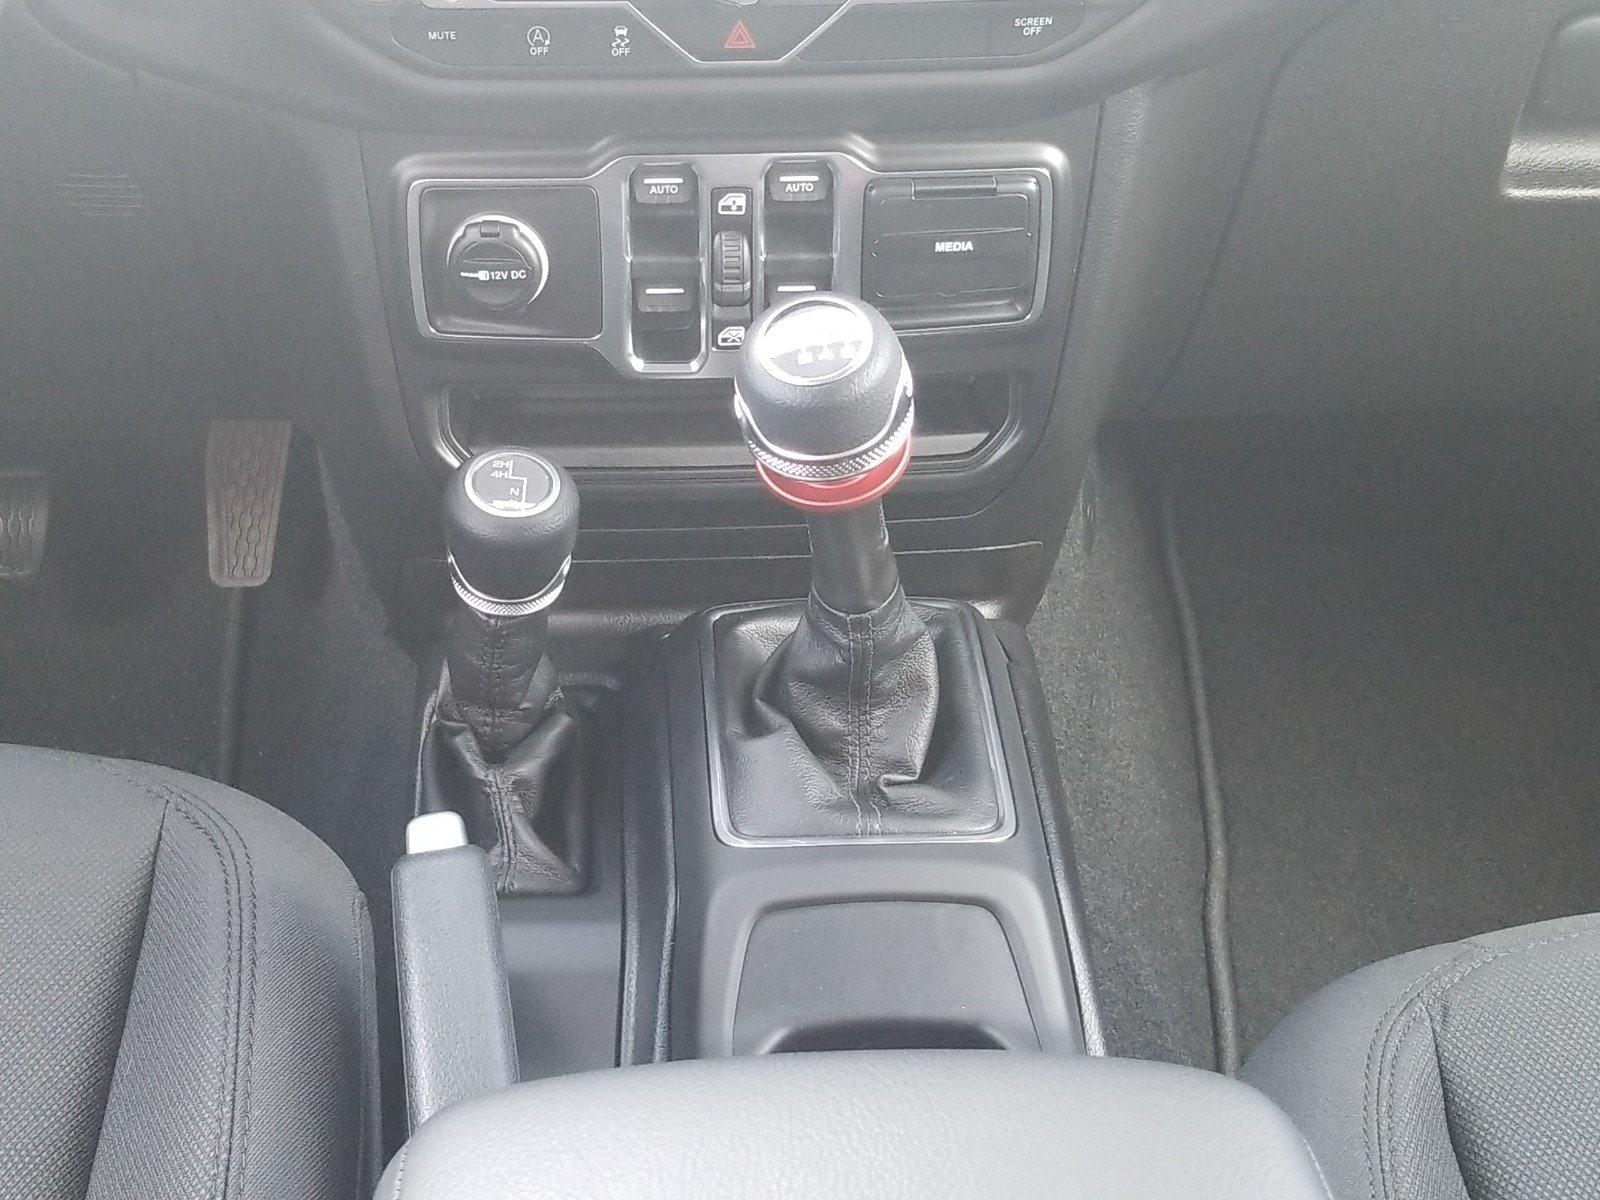 2018 Jeep Wrangler UNLIMITED SPORT S 4X4 For Sale in St Augustine, FL |  1C4HJXDG4JW239968